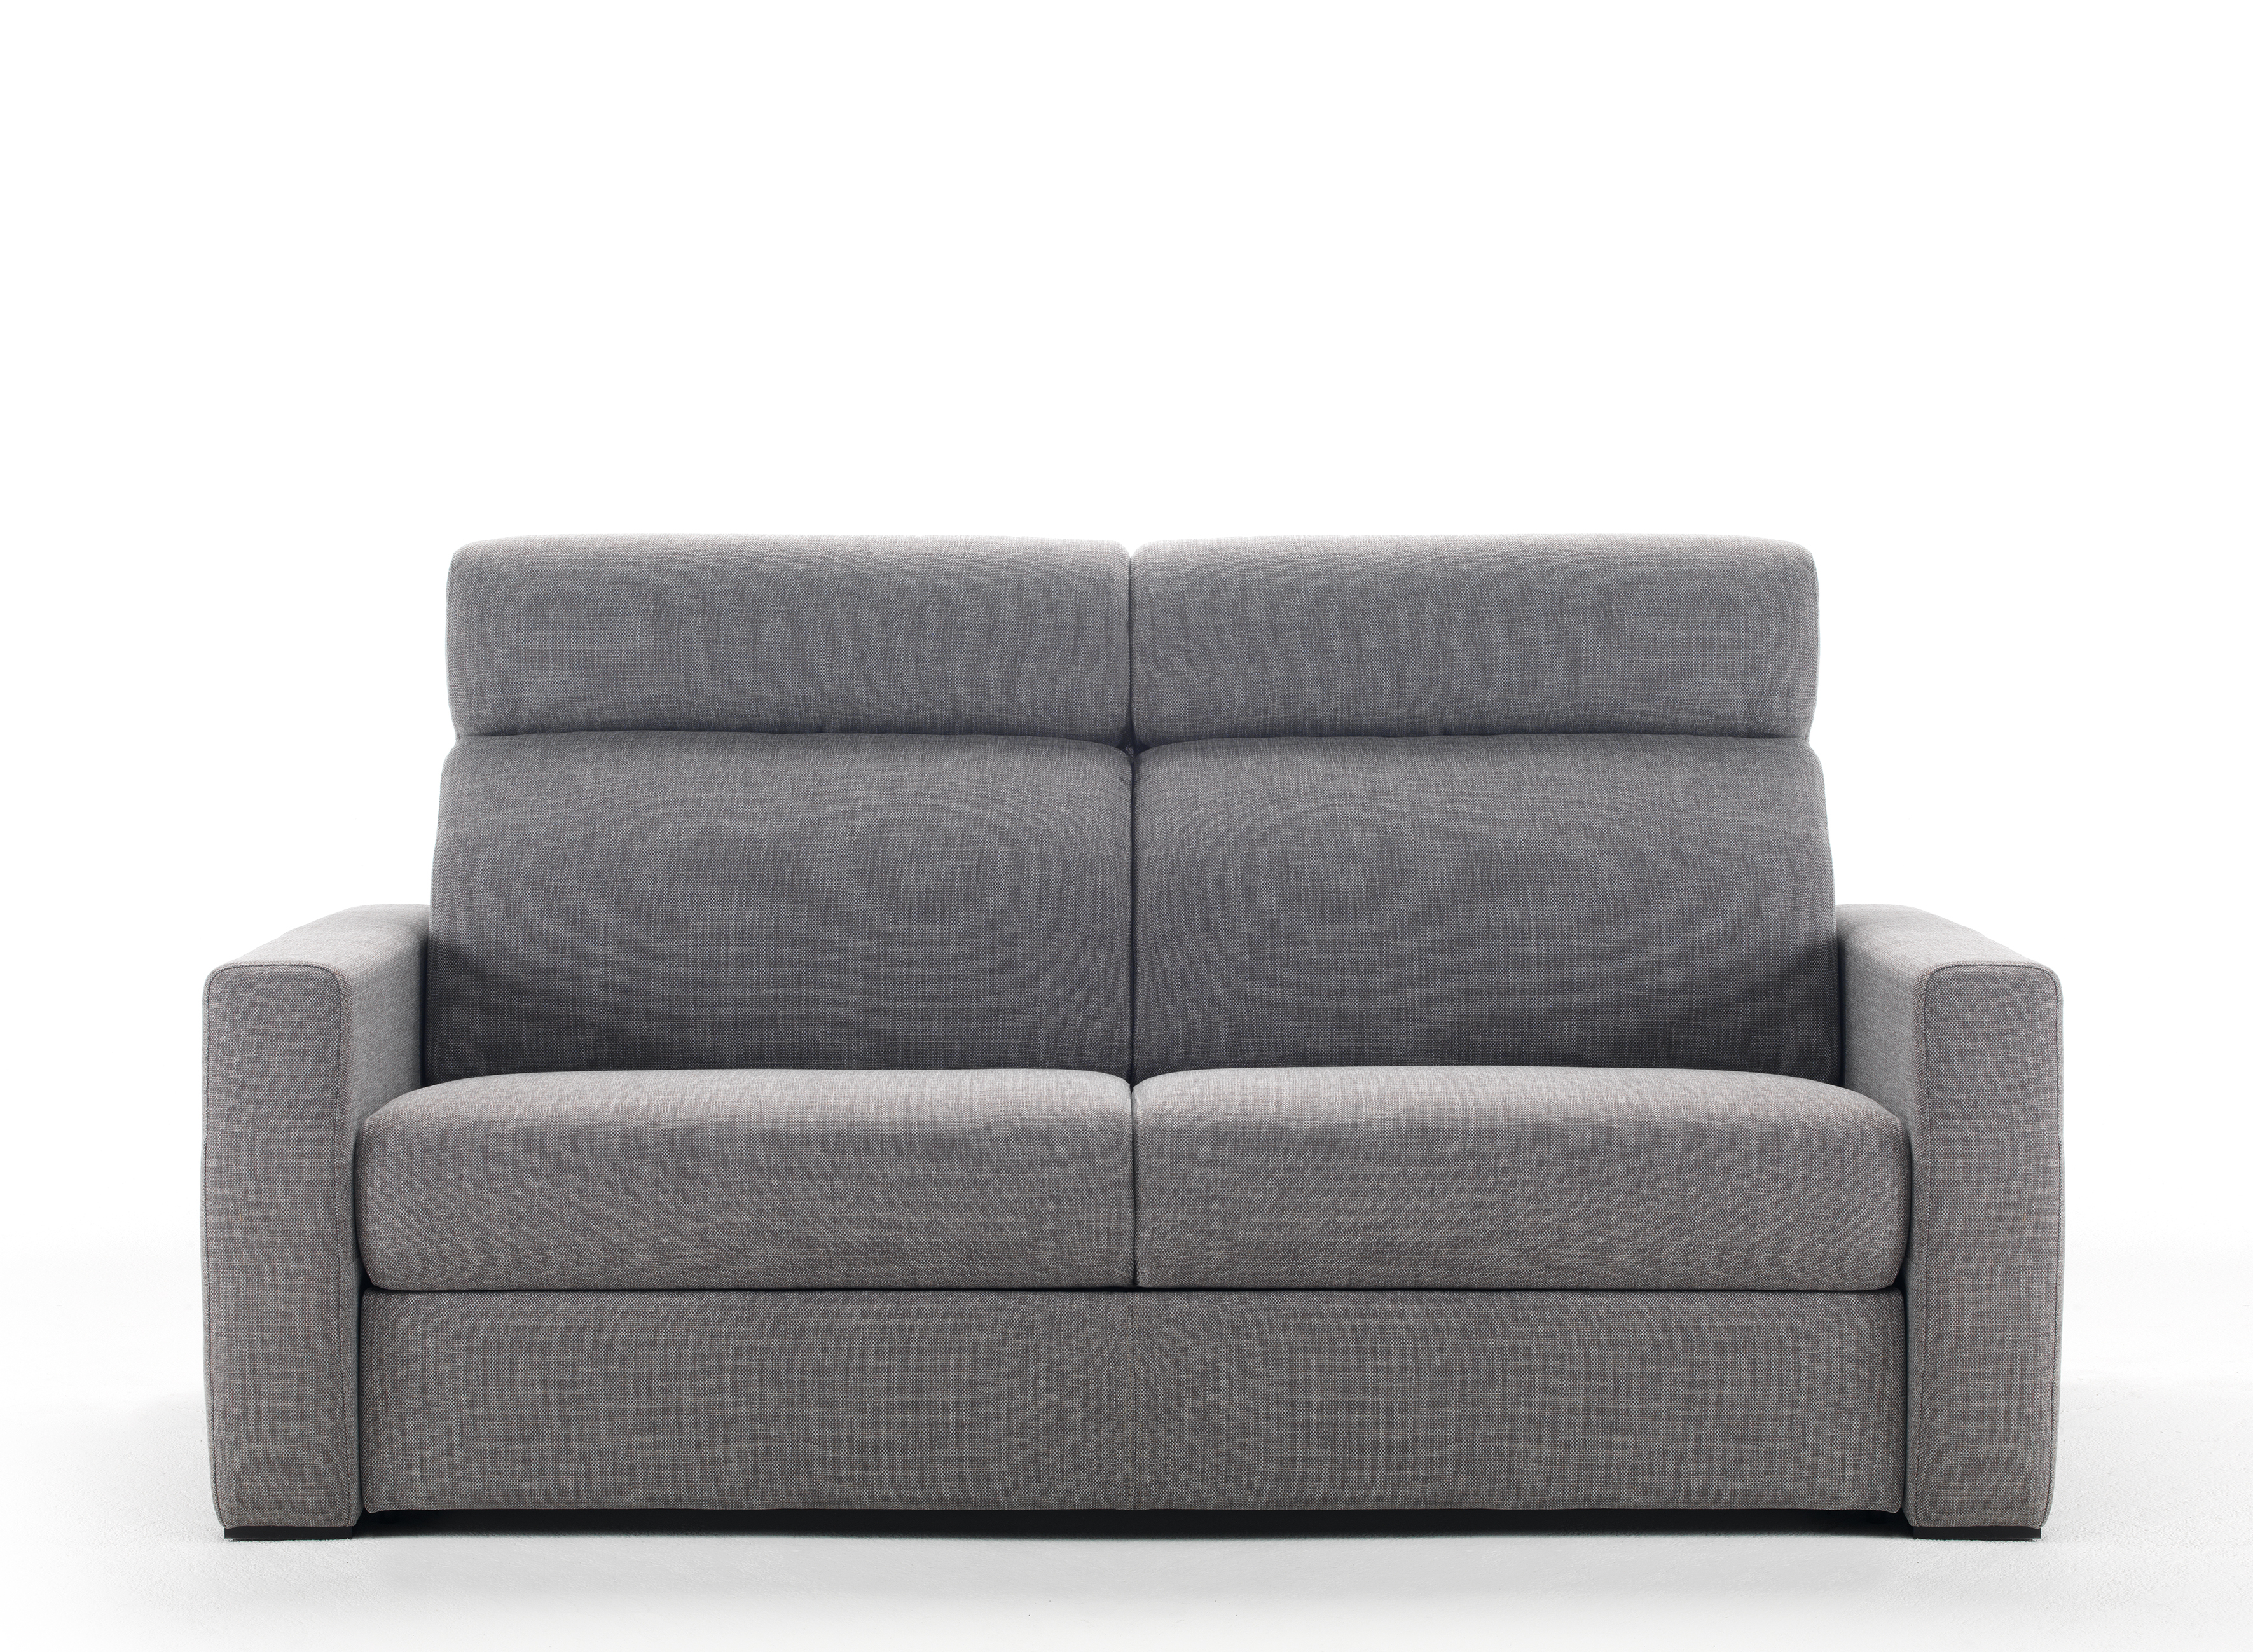 Convertible Contemporain : Confort destiné Canape Convertible Tres Confortable